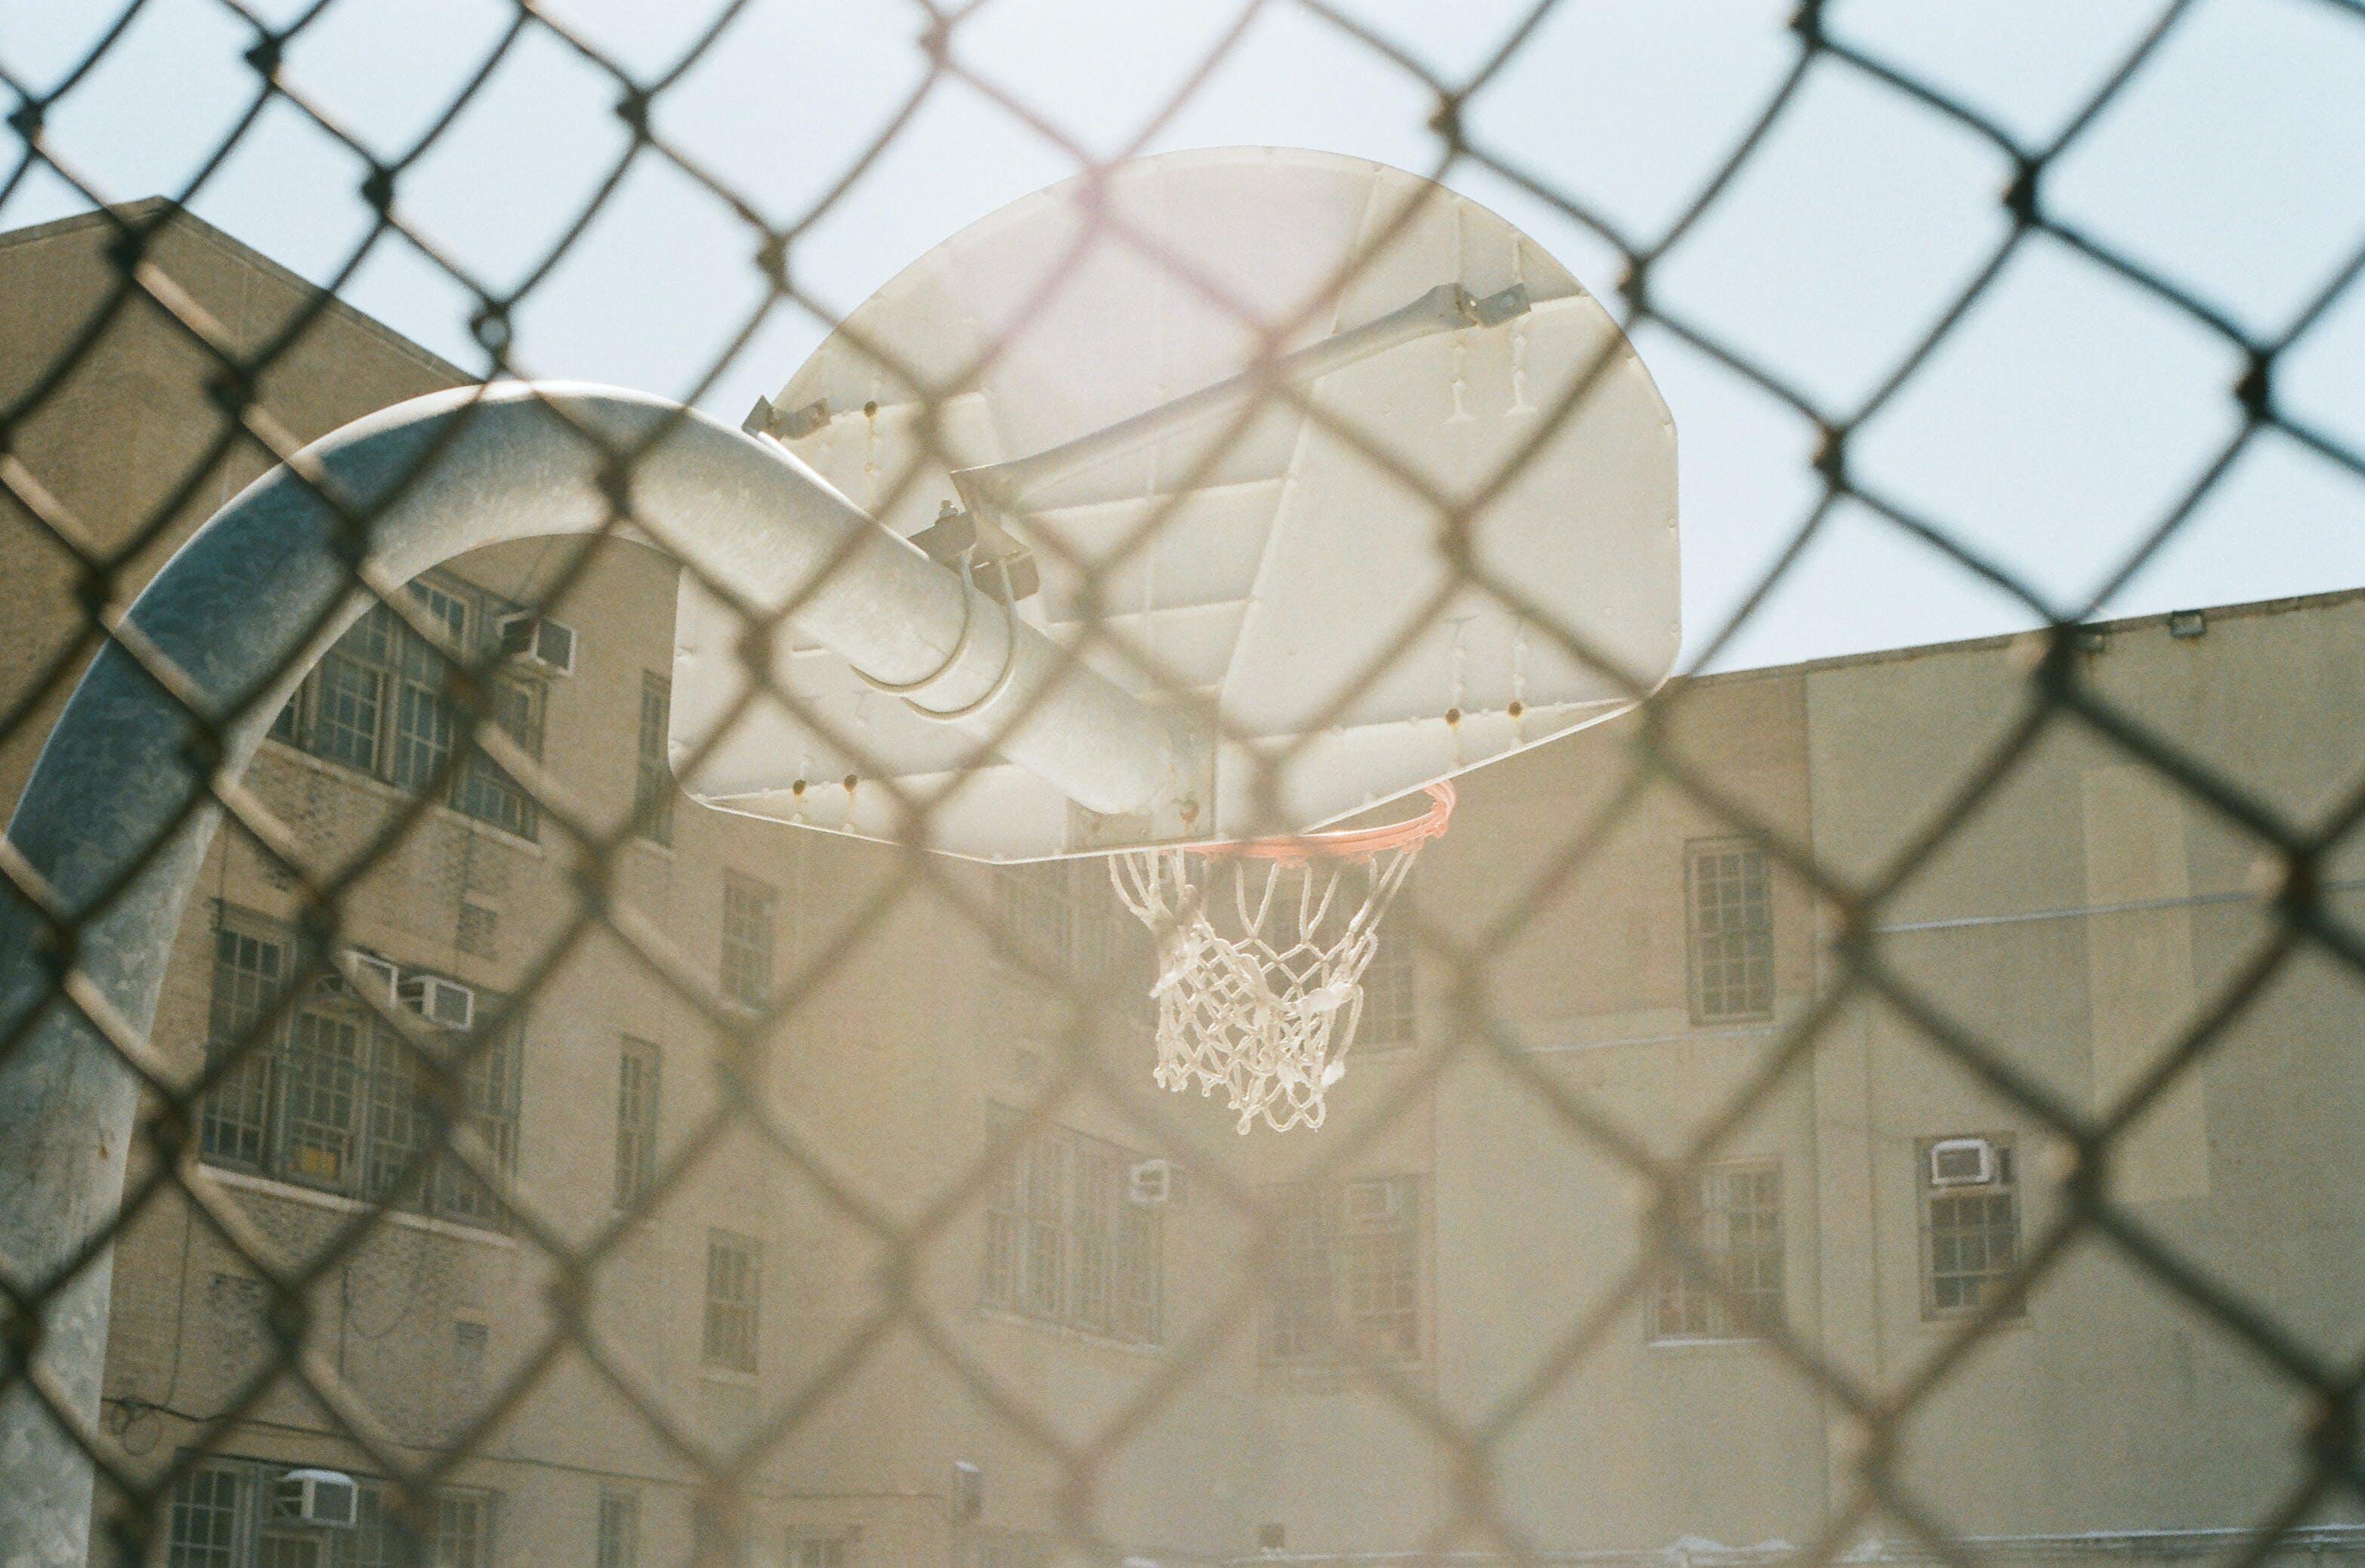 Kostenloses Stock Foto zu band, barriere, basketball, basketball platz